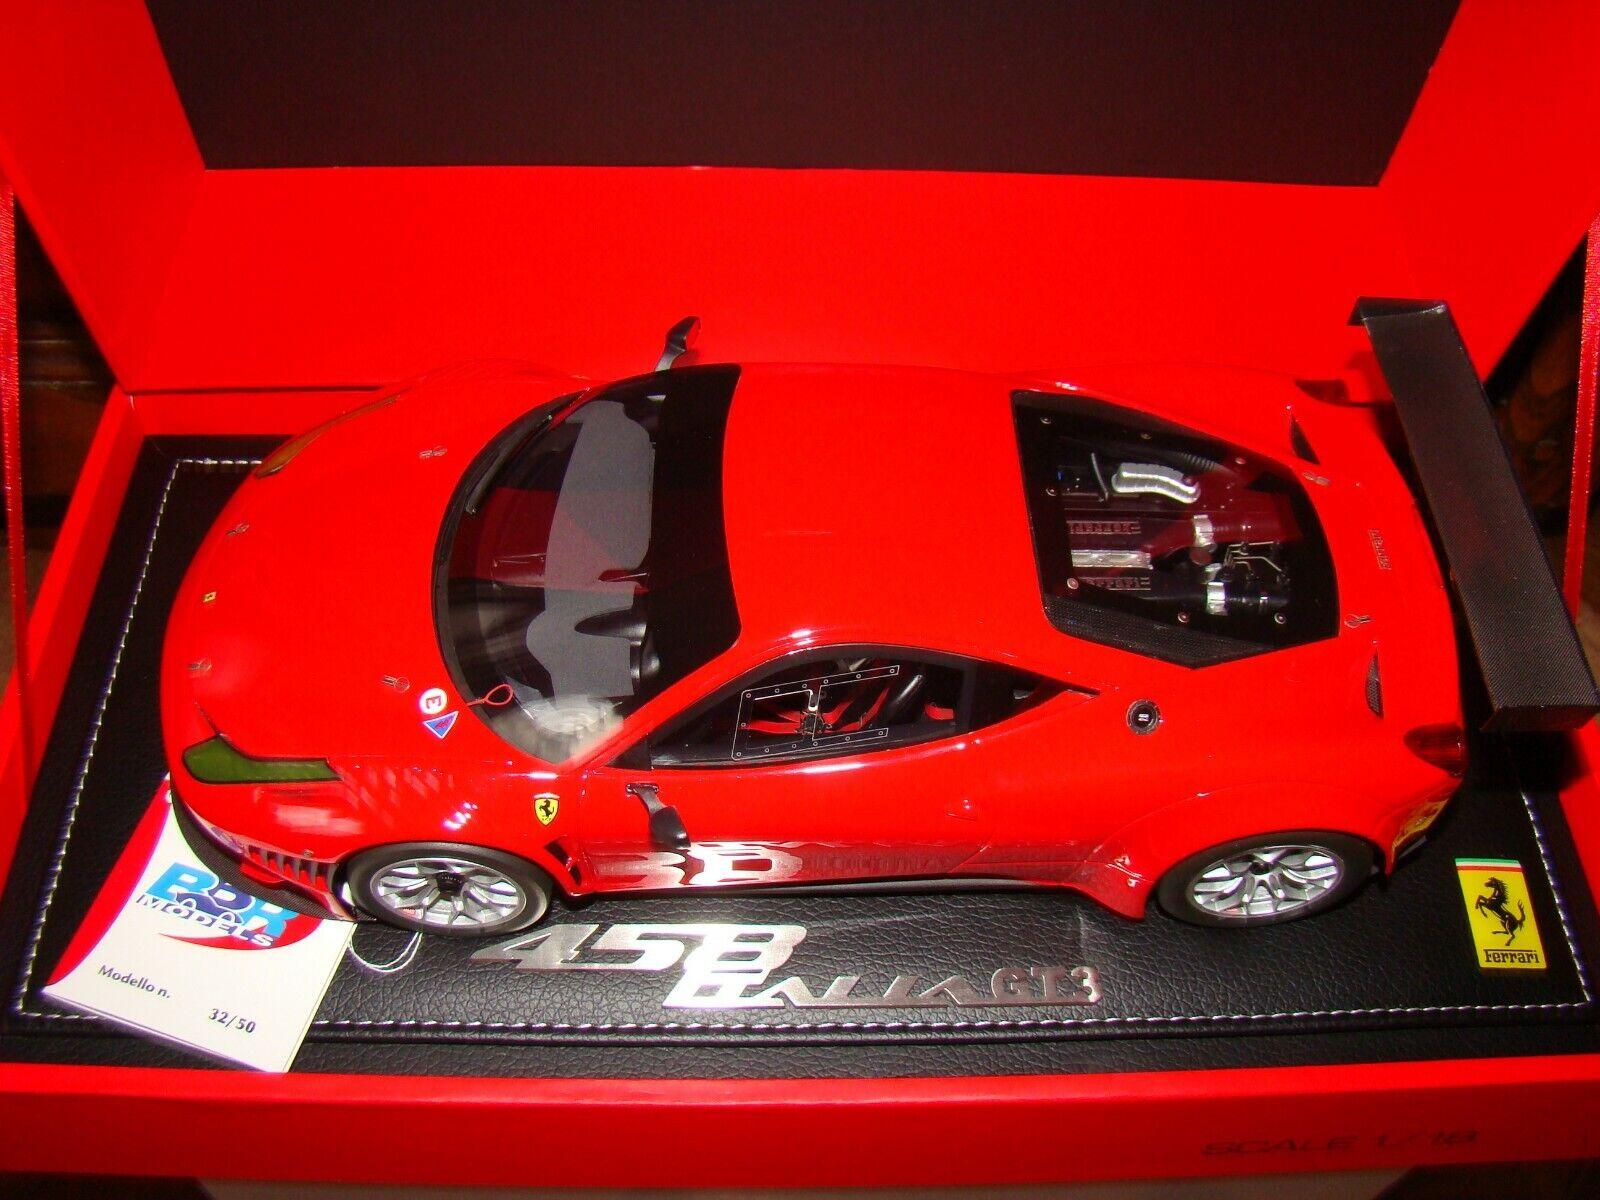 Ferrari 458 Italia Gt3 2011 Rosso Scuderia Bbr 1 18eme Limited 50Uds Muy Raro